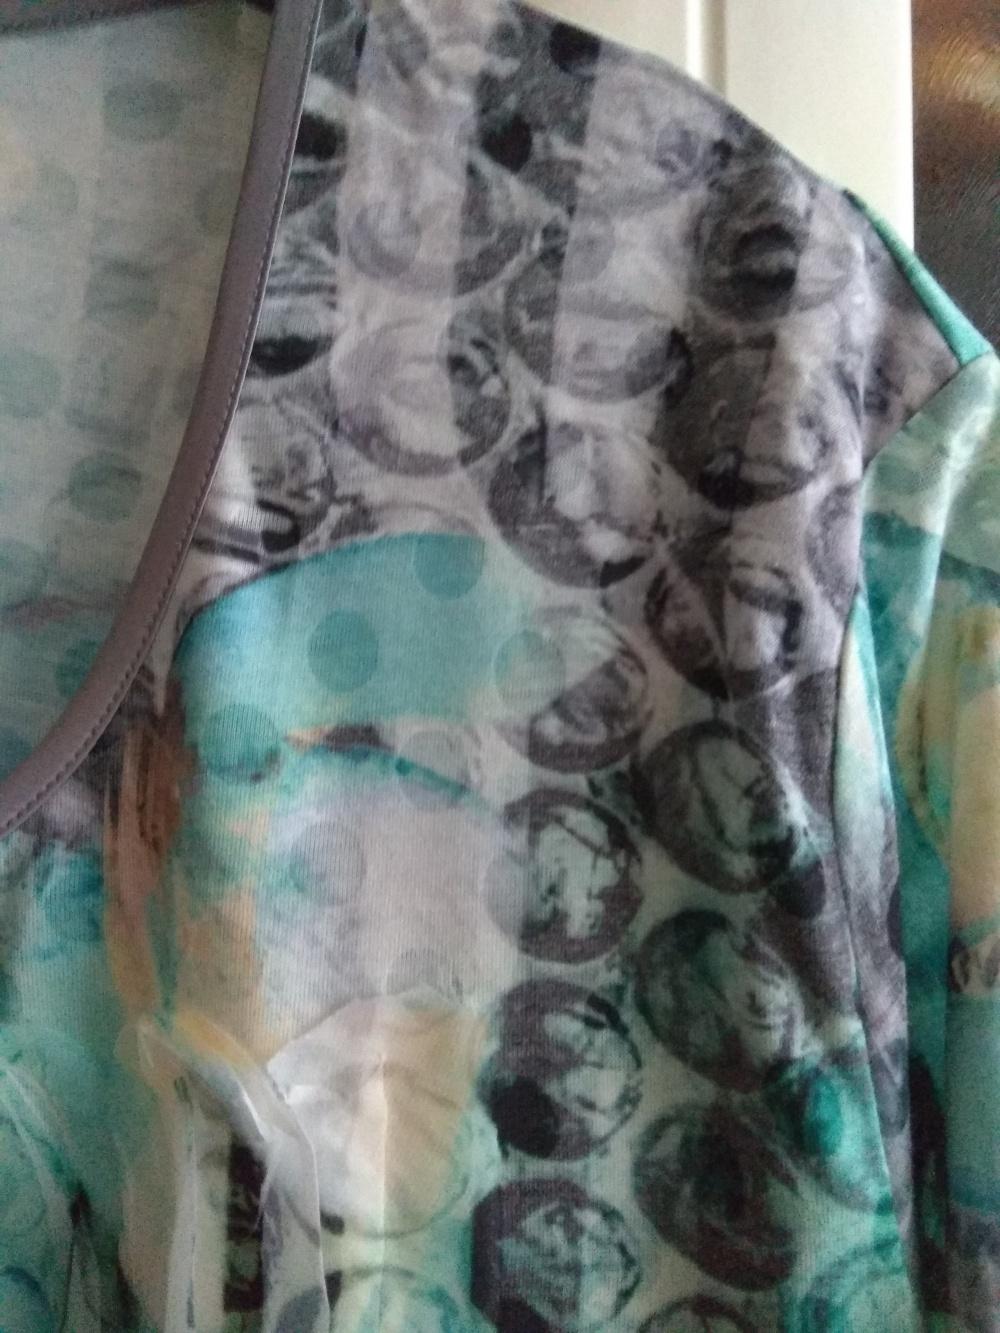 Блузка Gerry Weber, размер 48 (нем) = 52-54-56 (рос)